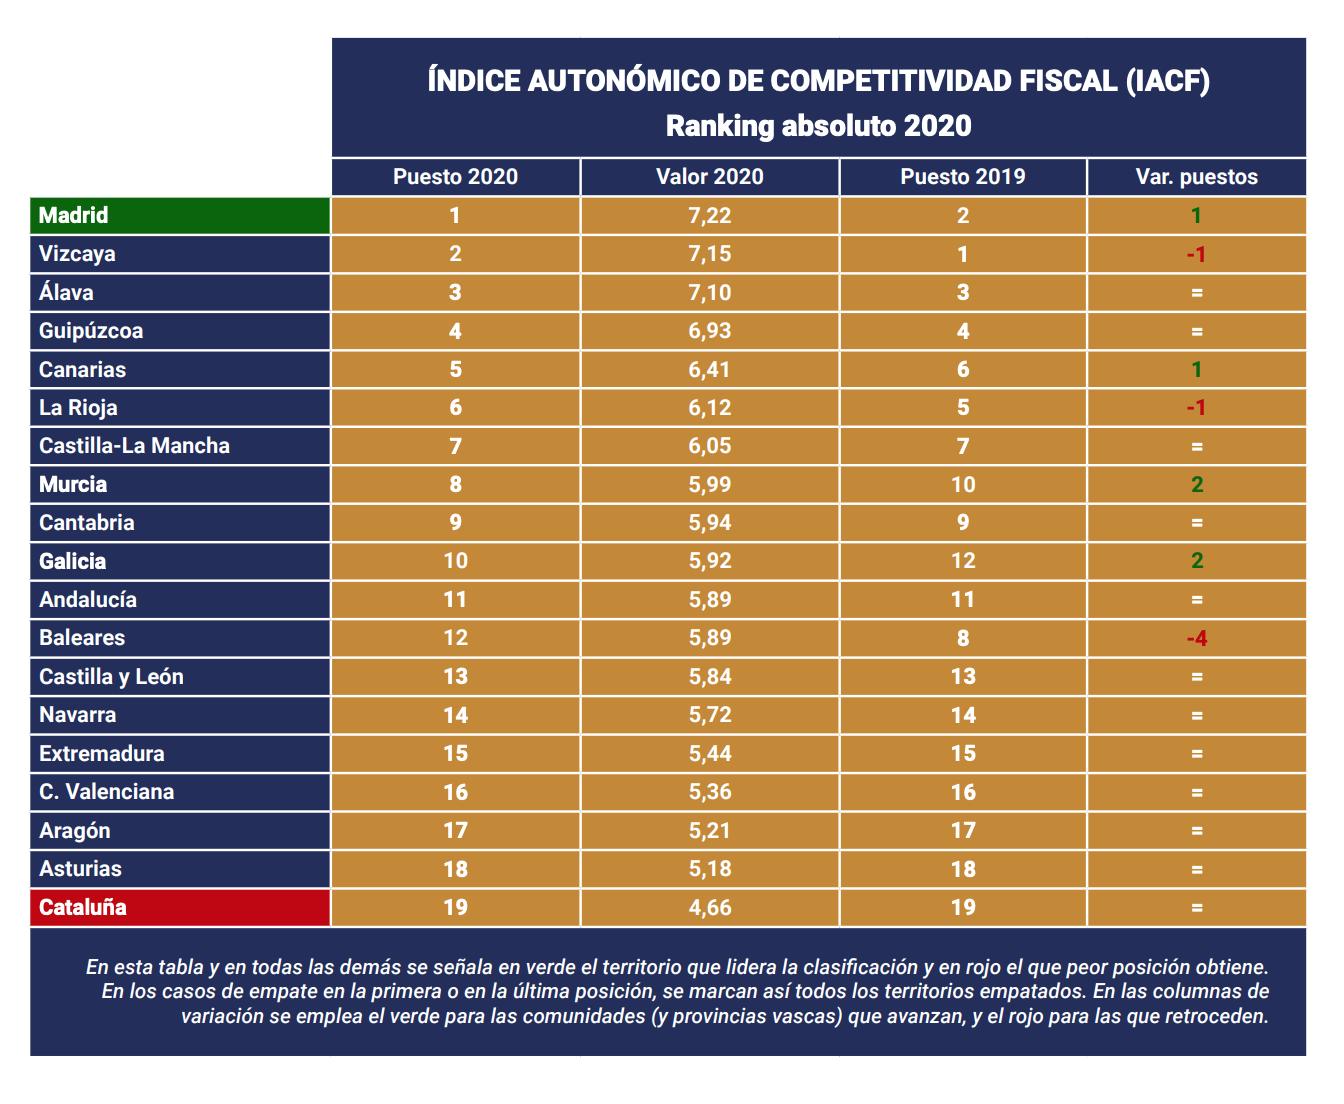 indice-autonomico-competitividad-fiscal-espana-ccaa-2020.png